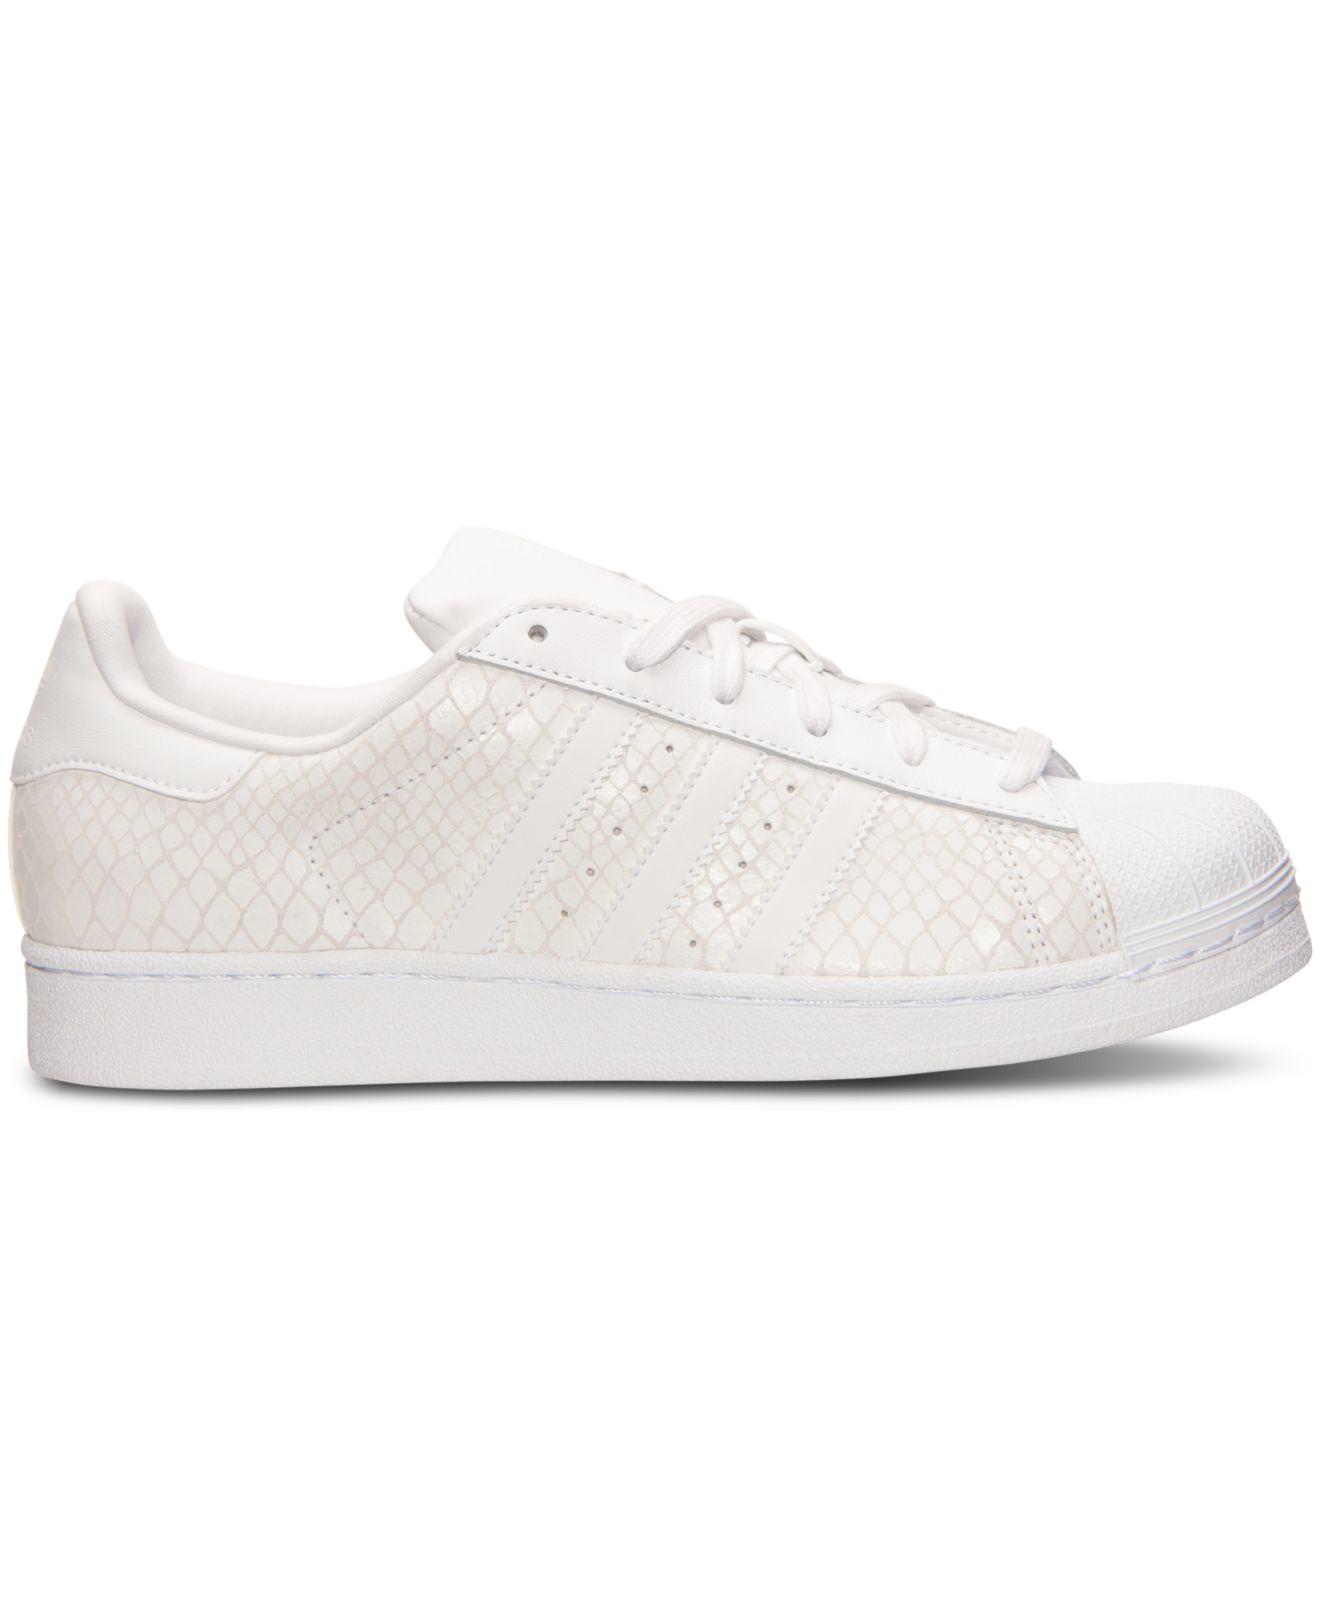 Lyst - adidas Originals Women s Superstar Casual Sneakers From ... c8e830d9e